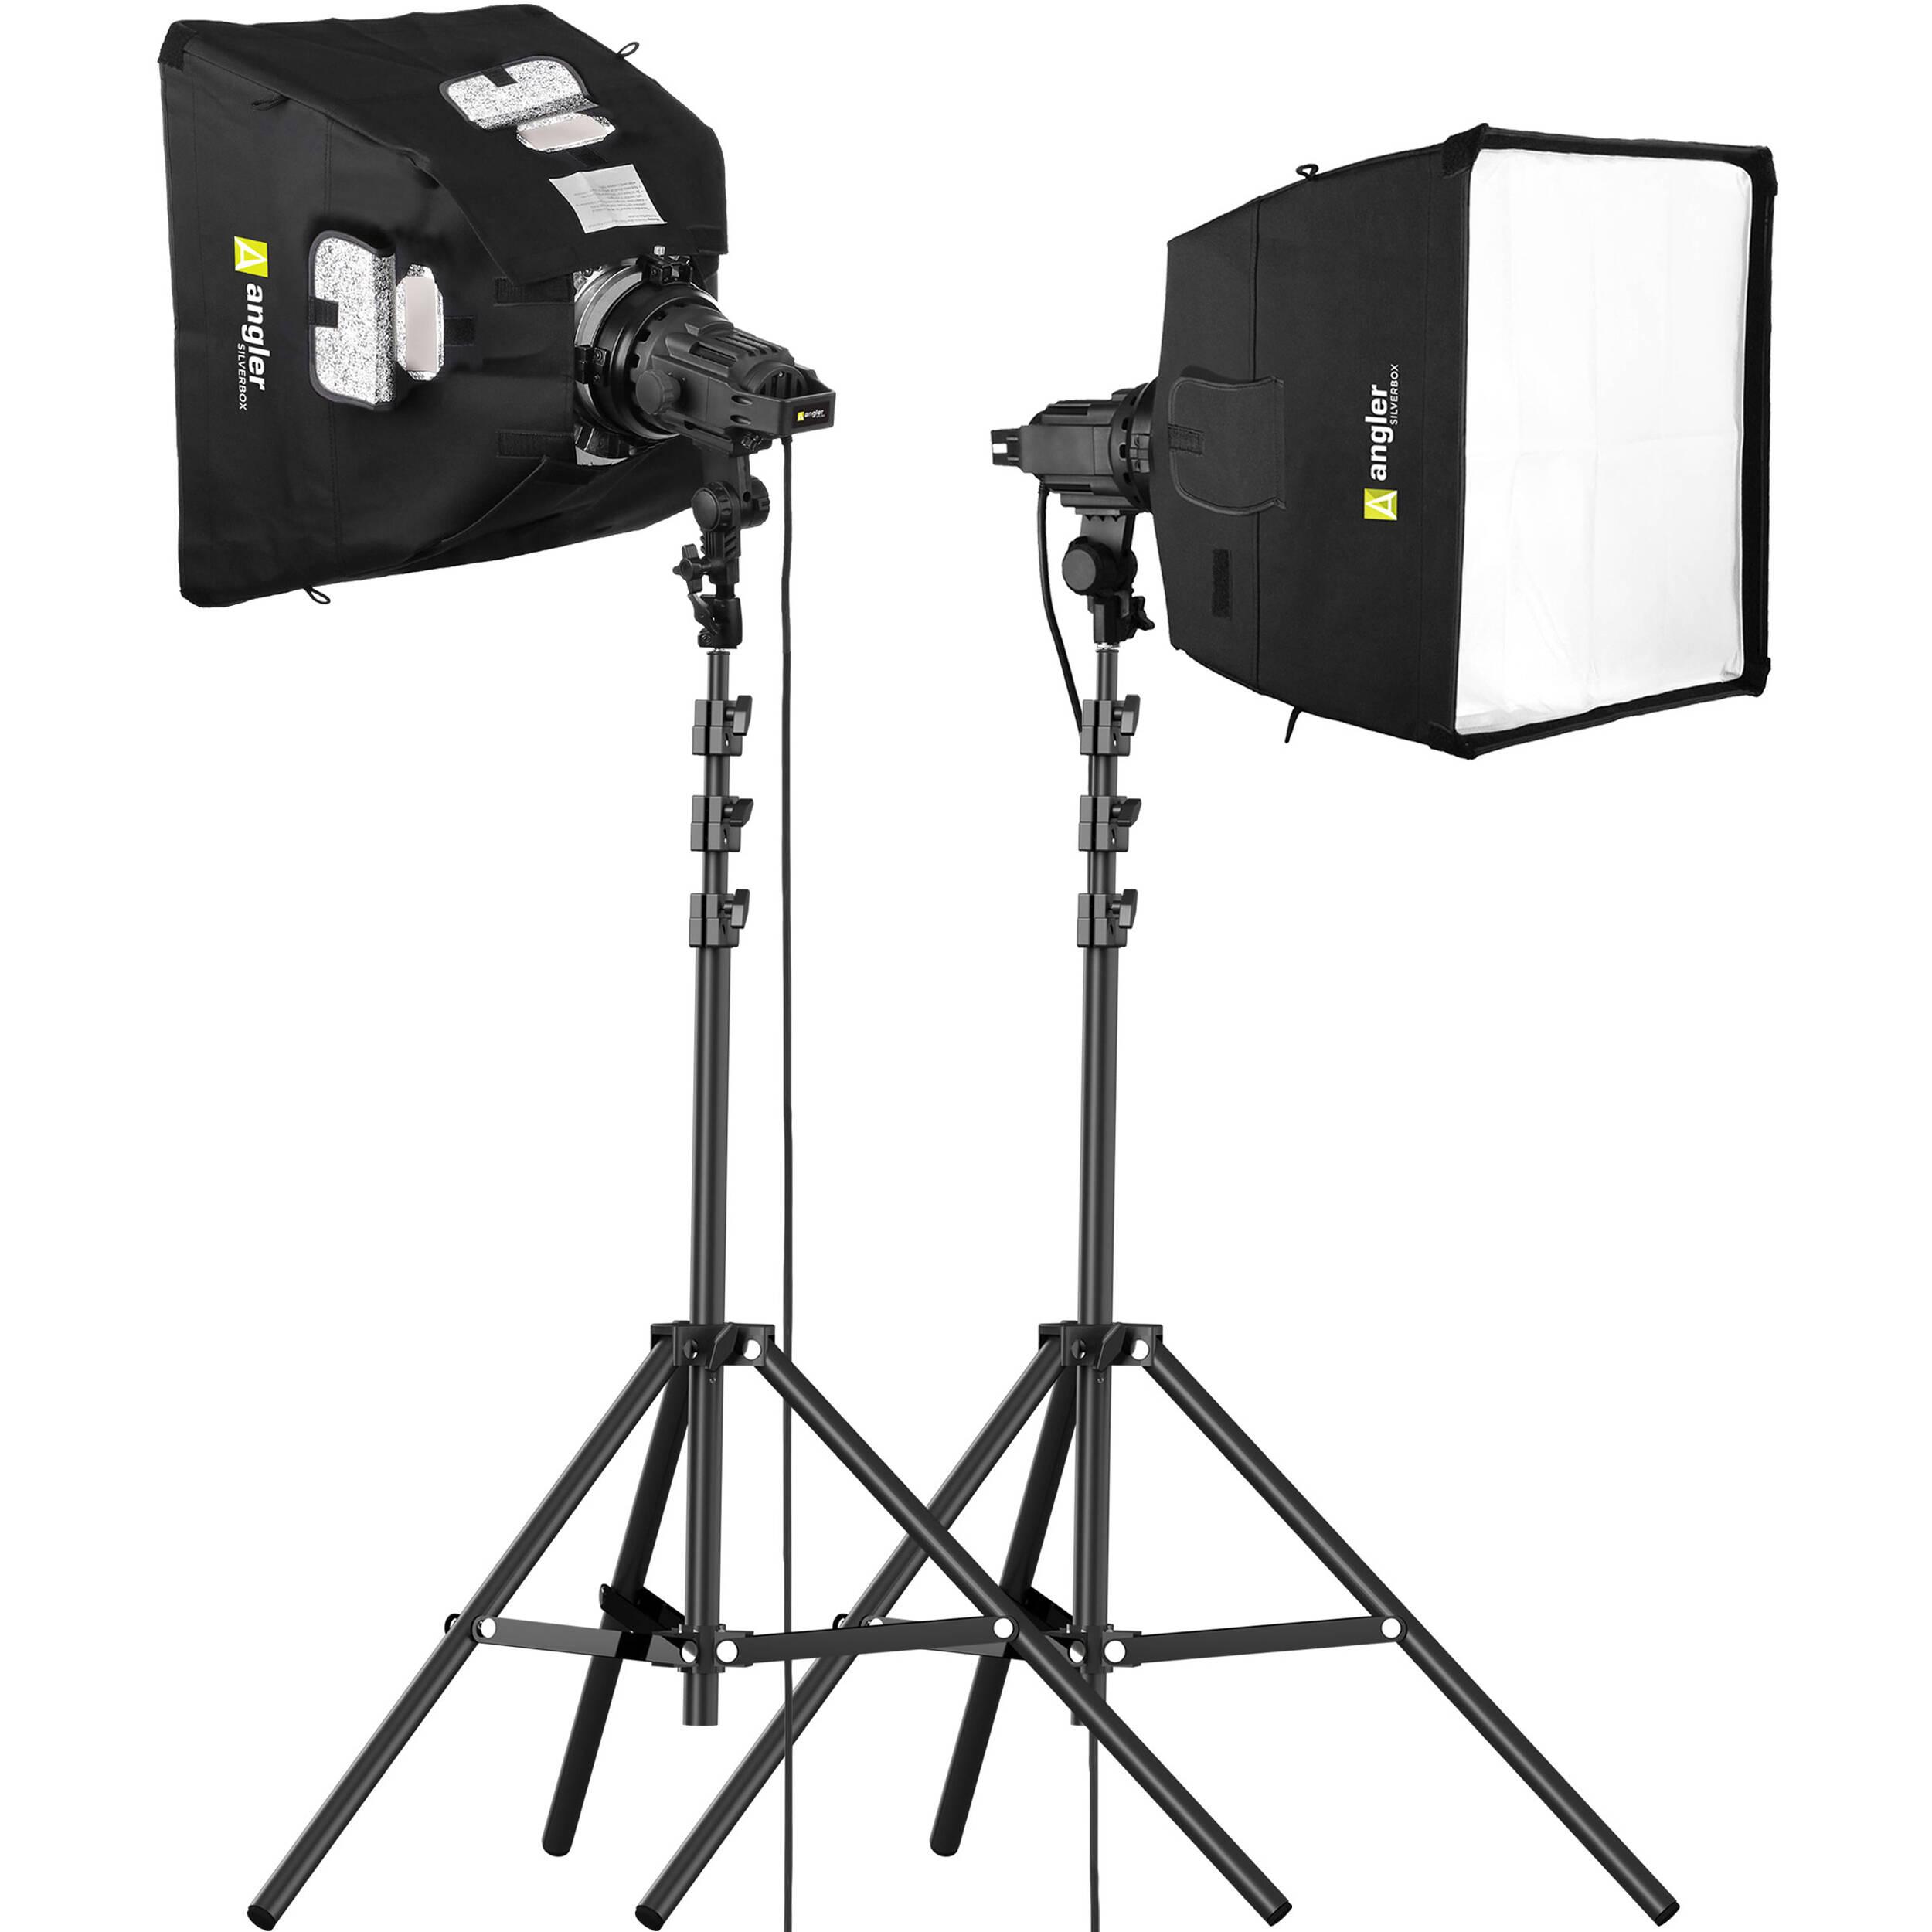 Impact Luxbanx Duo Large Square Softbox 40 x 40